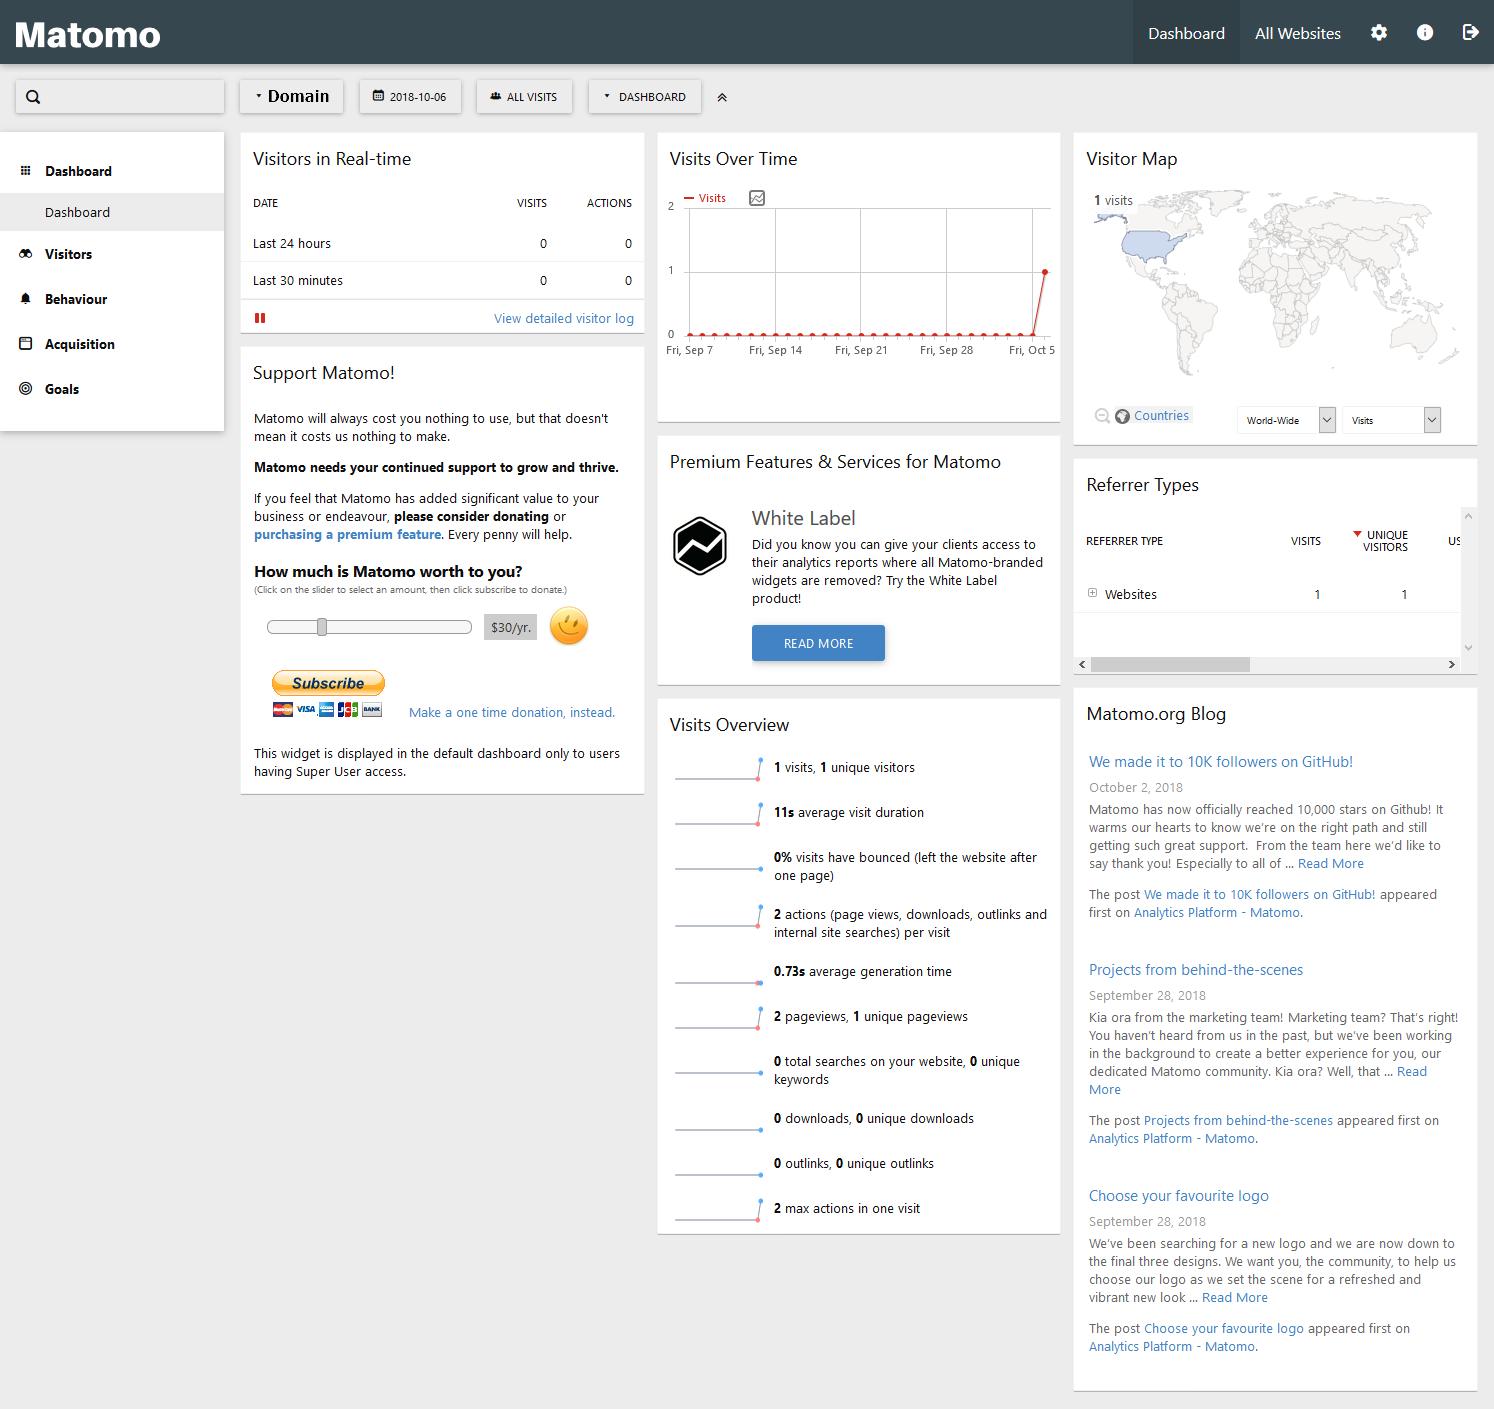 Matomo website dashboard